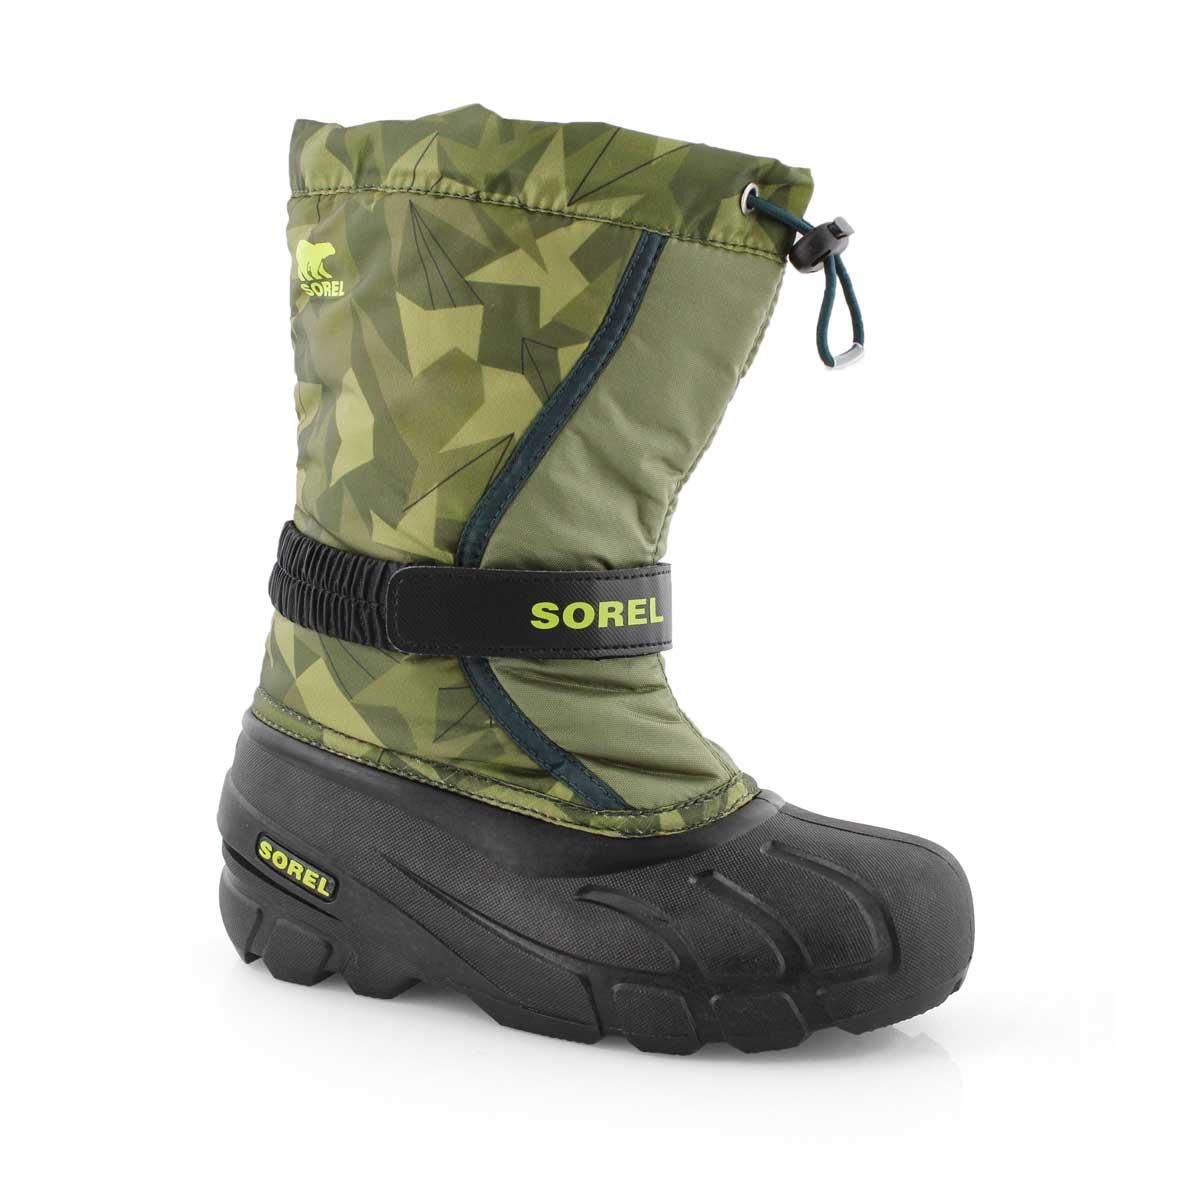 Bys Flurry Print grn/blk winter boot